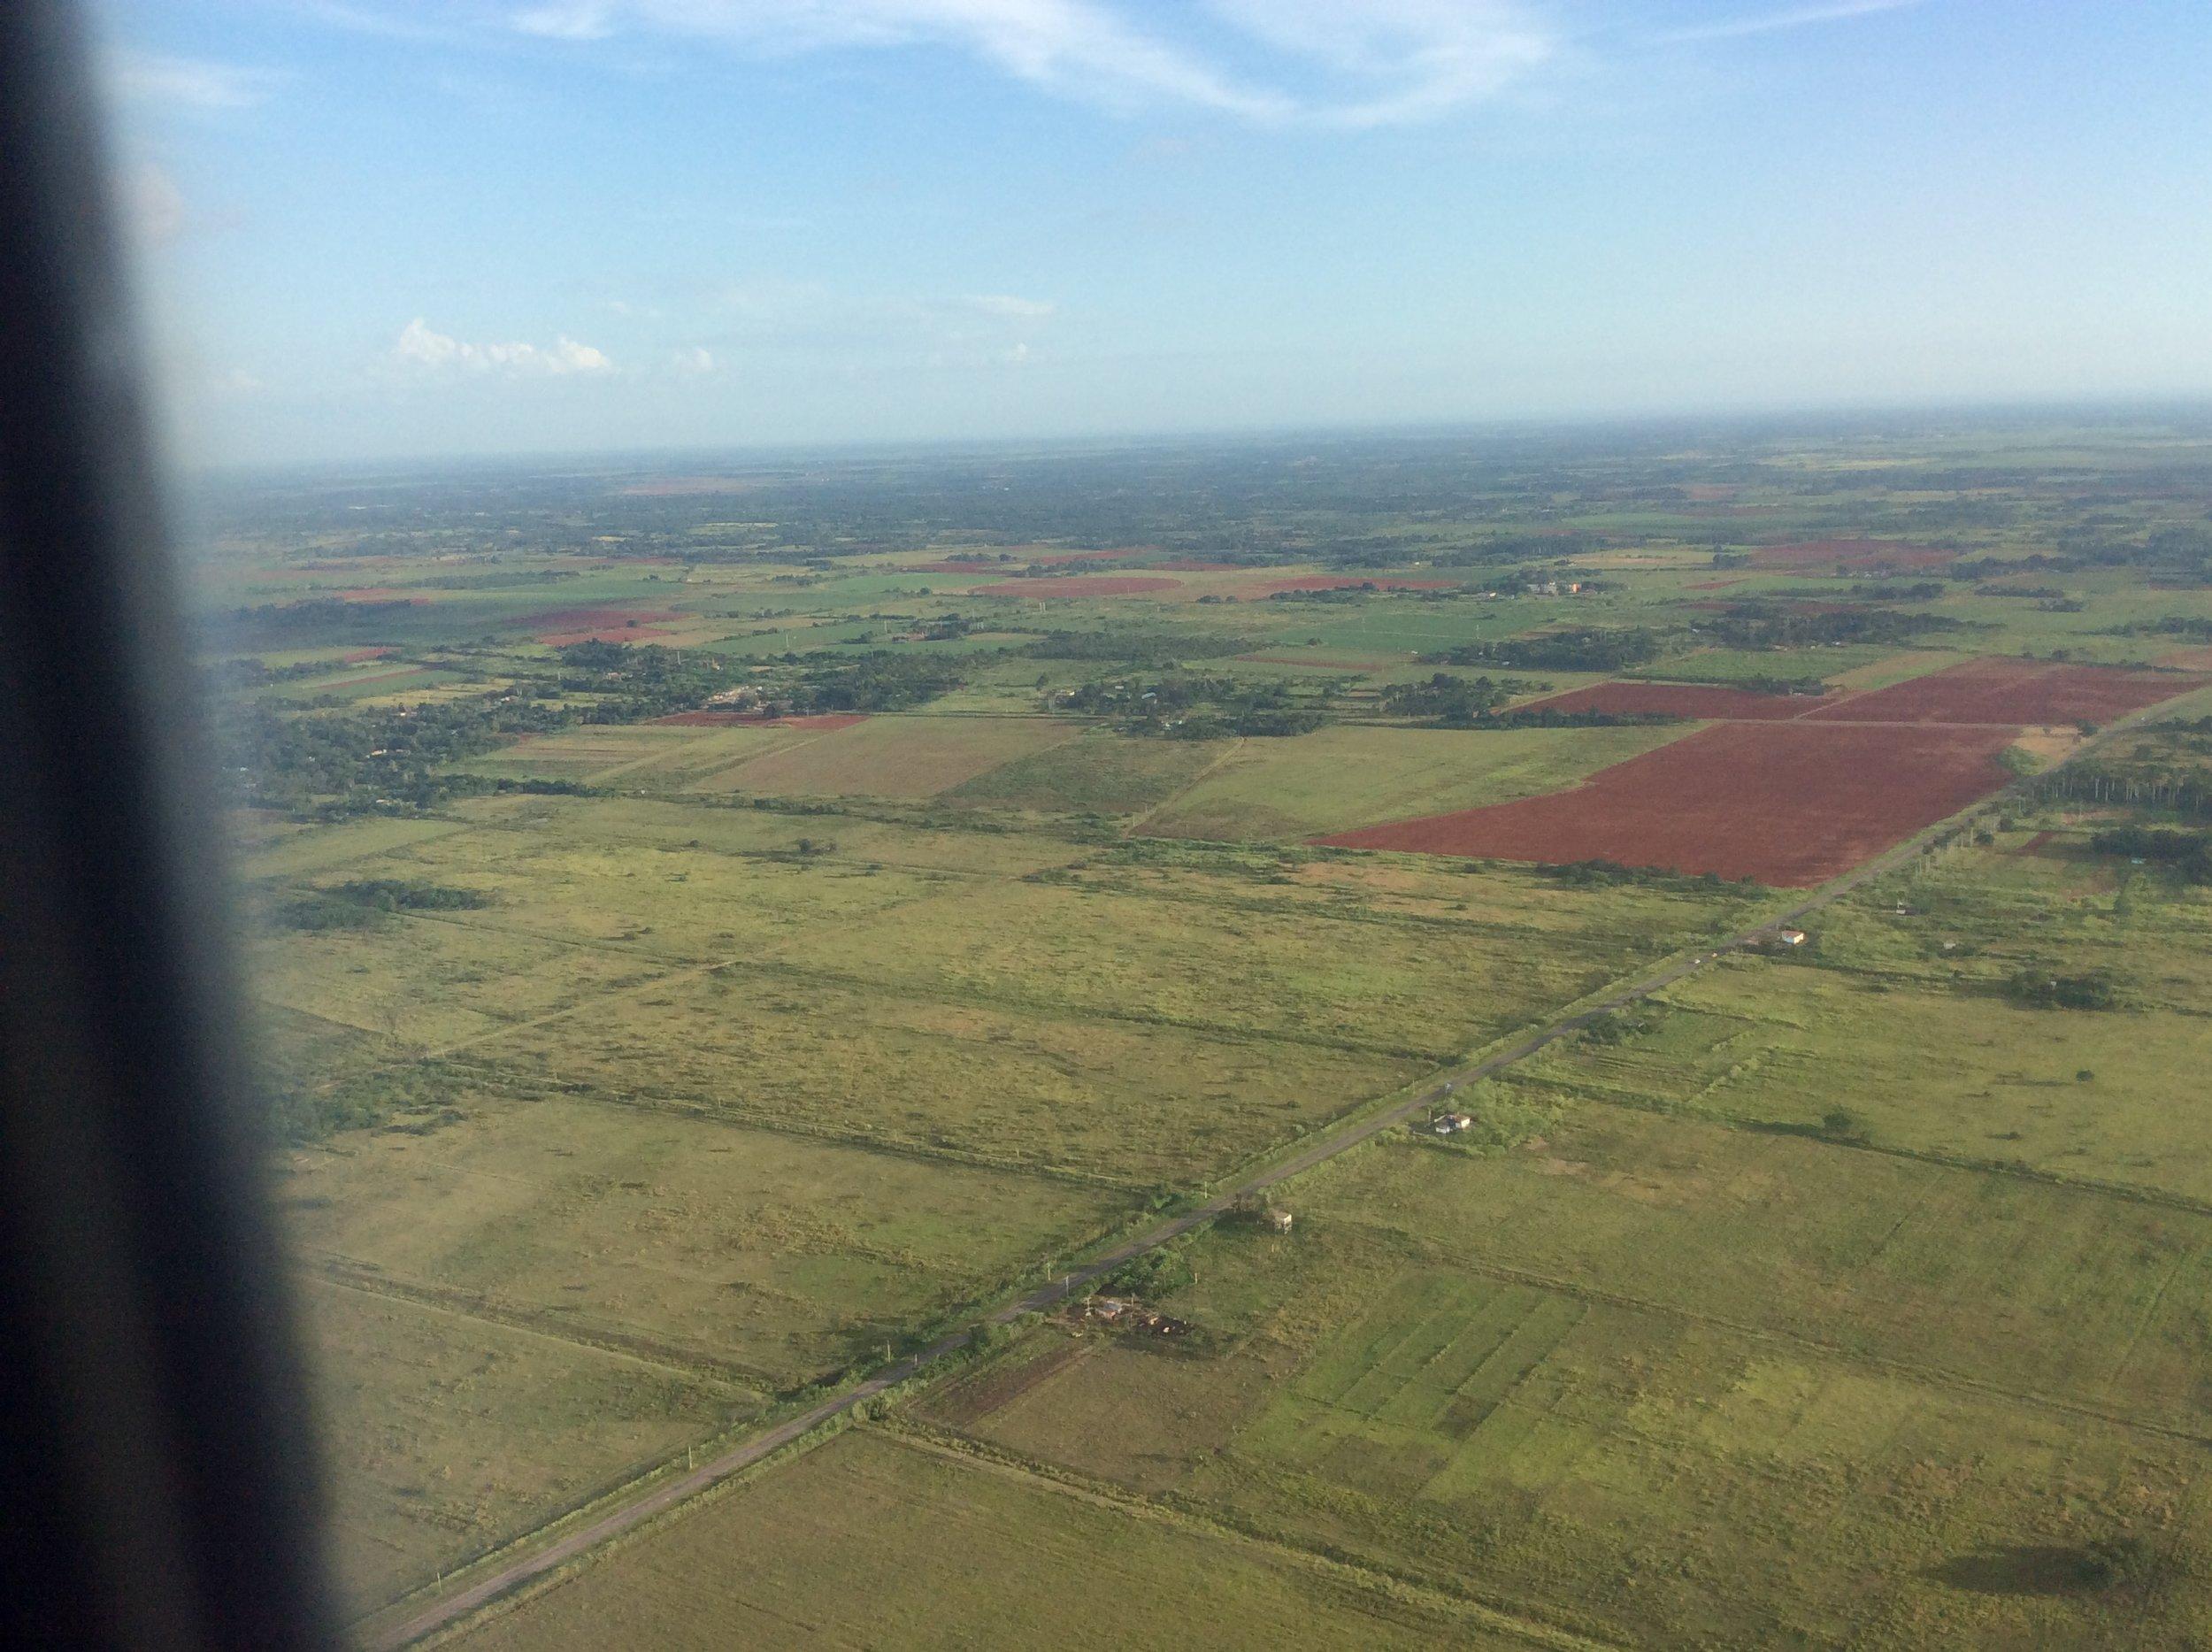 First view of Cuba before landing in Havana